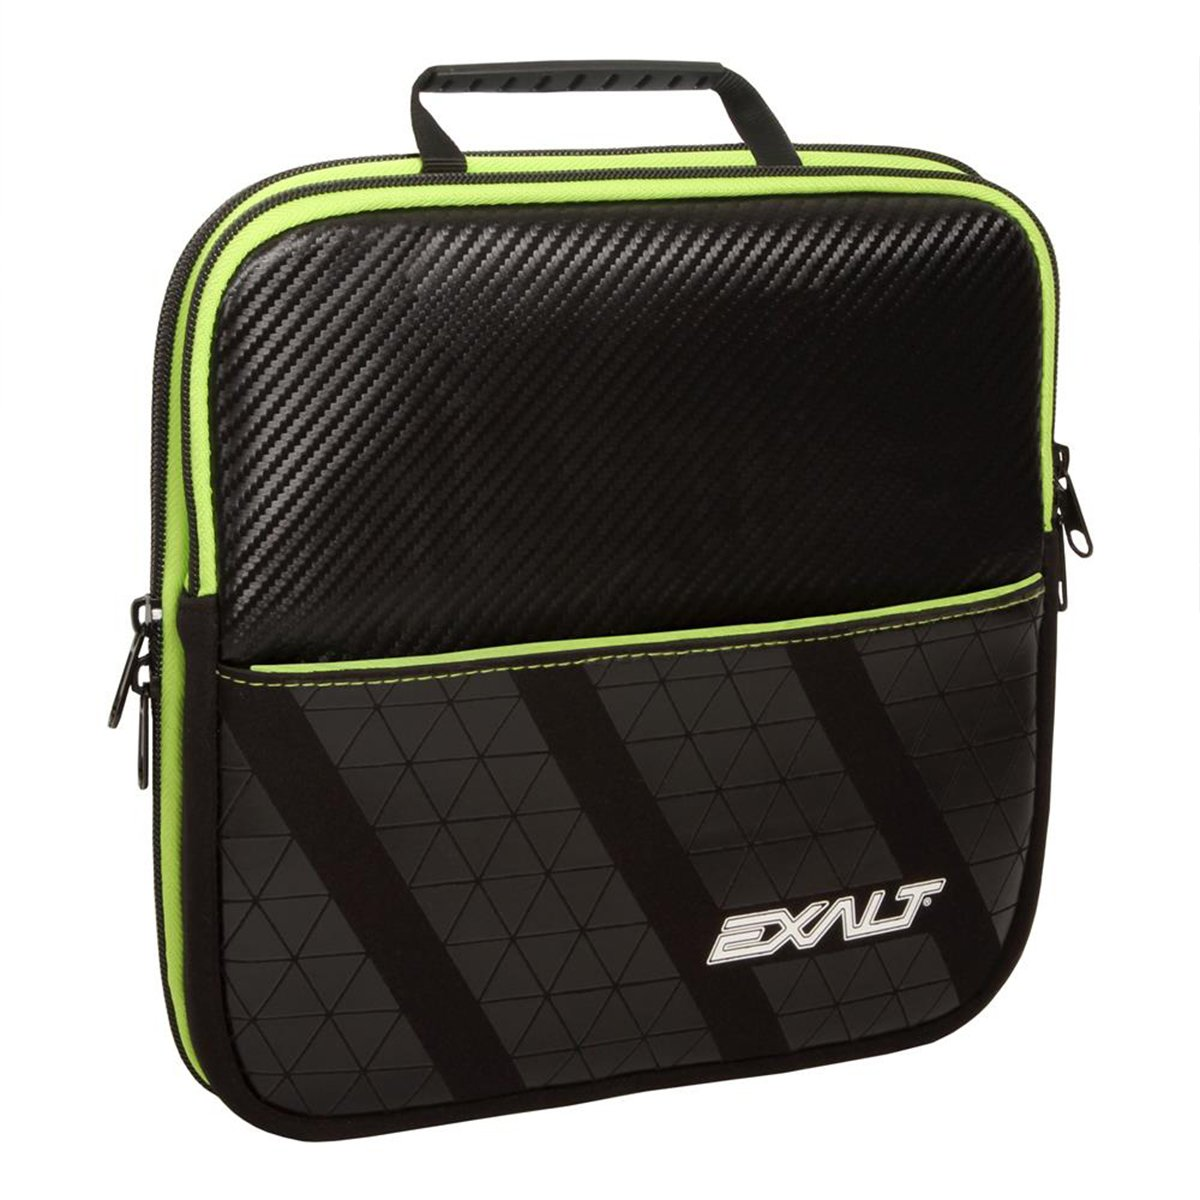 Exalt Paintball Marker Bag/Gun Case